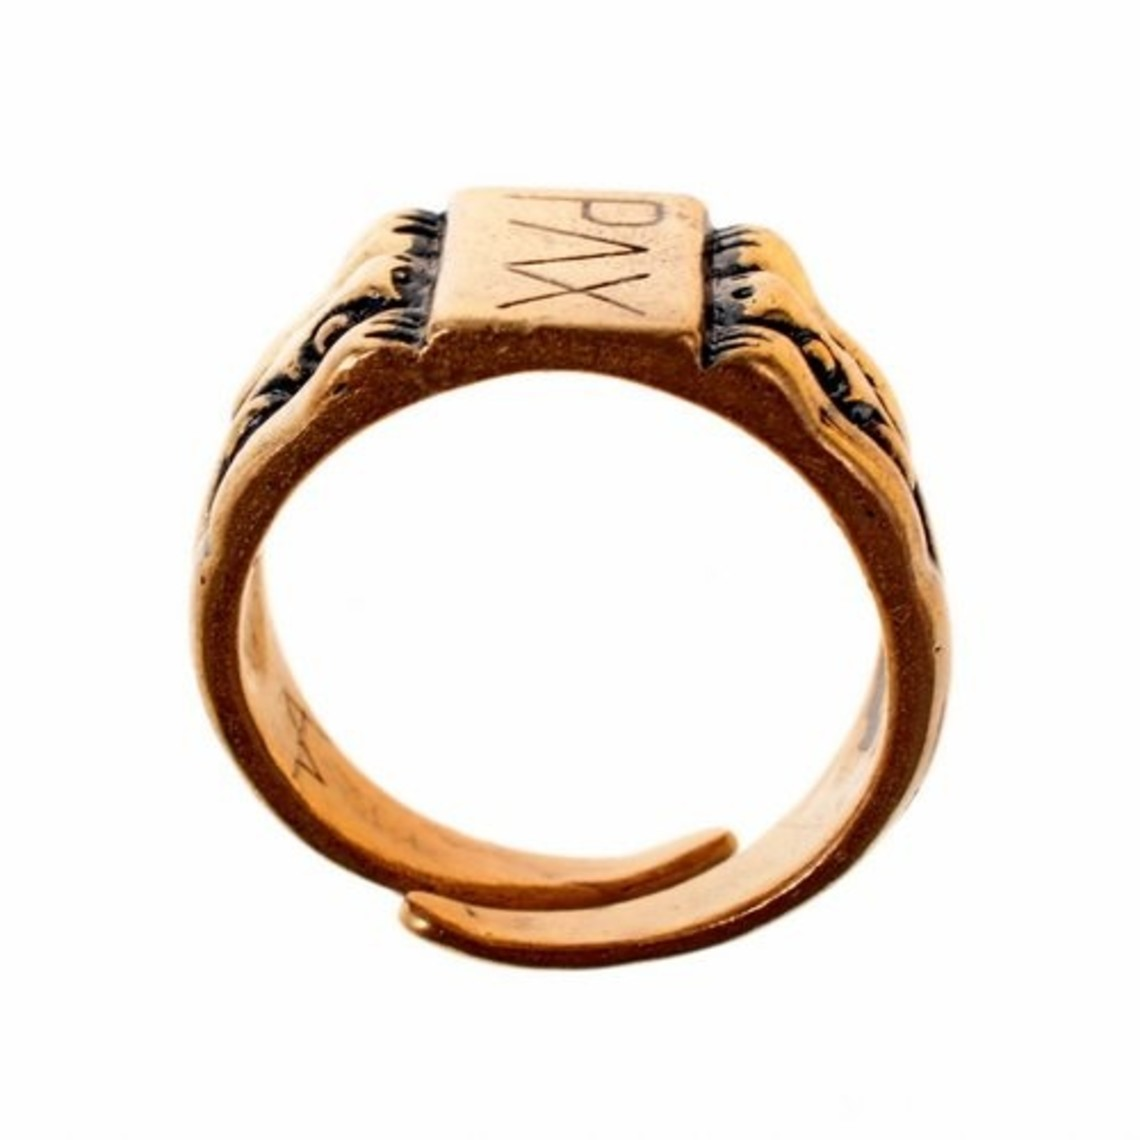 Paz anillo medieval